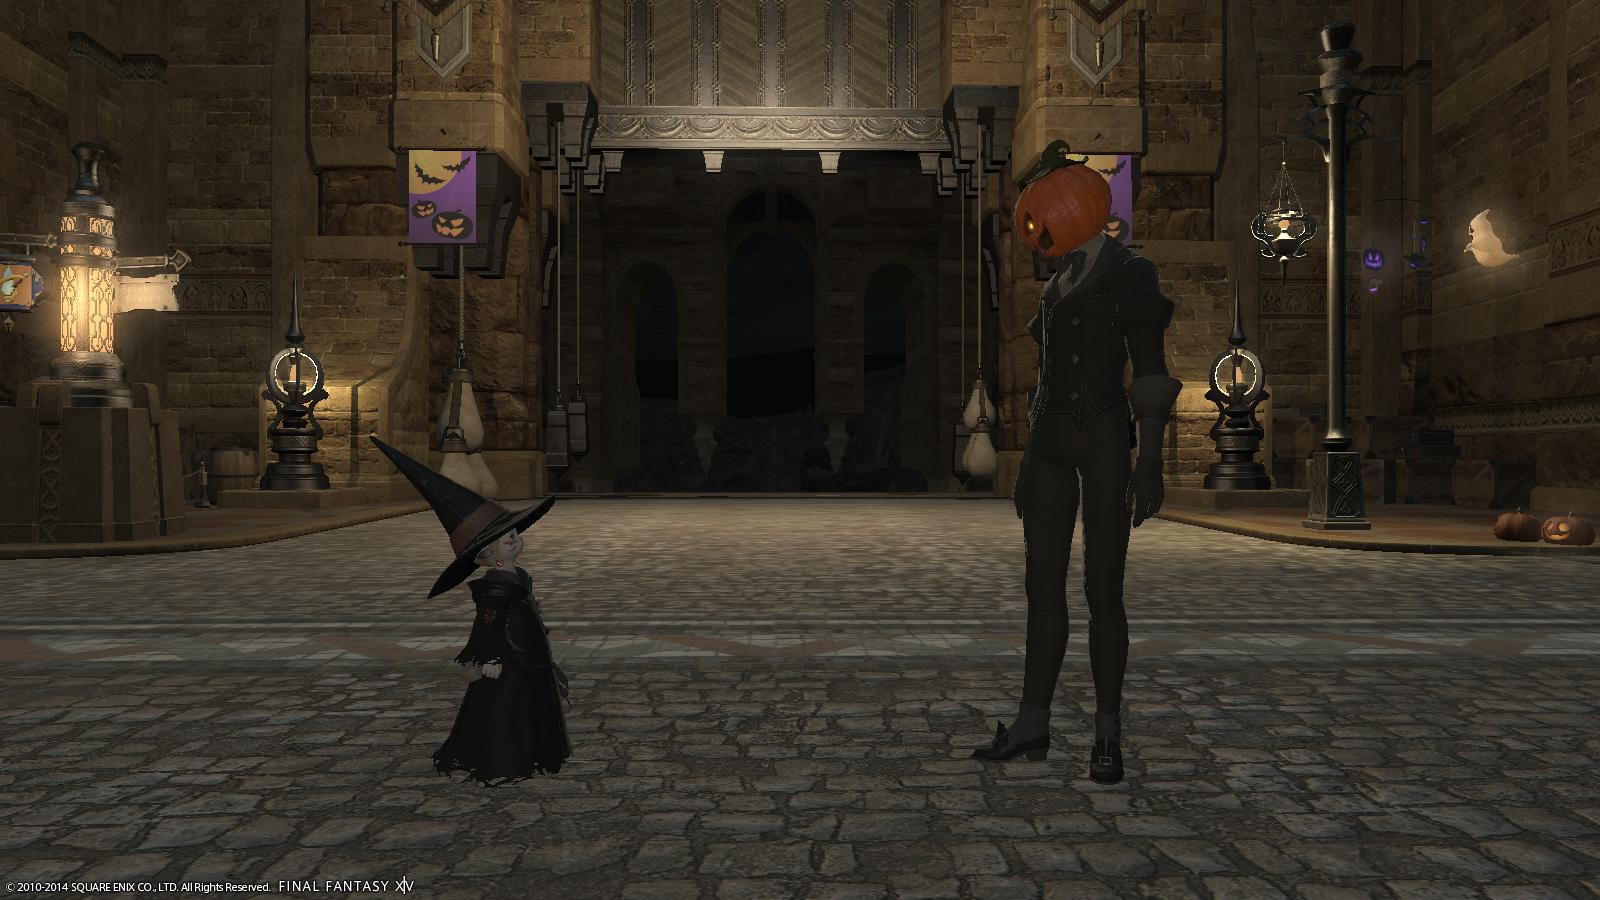 The Bishi Watch: Final Fantasy XIV Halloween - All Saints Wake 2014